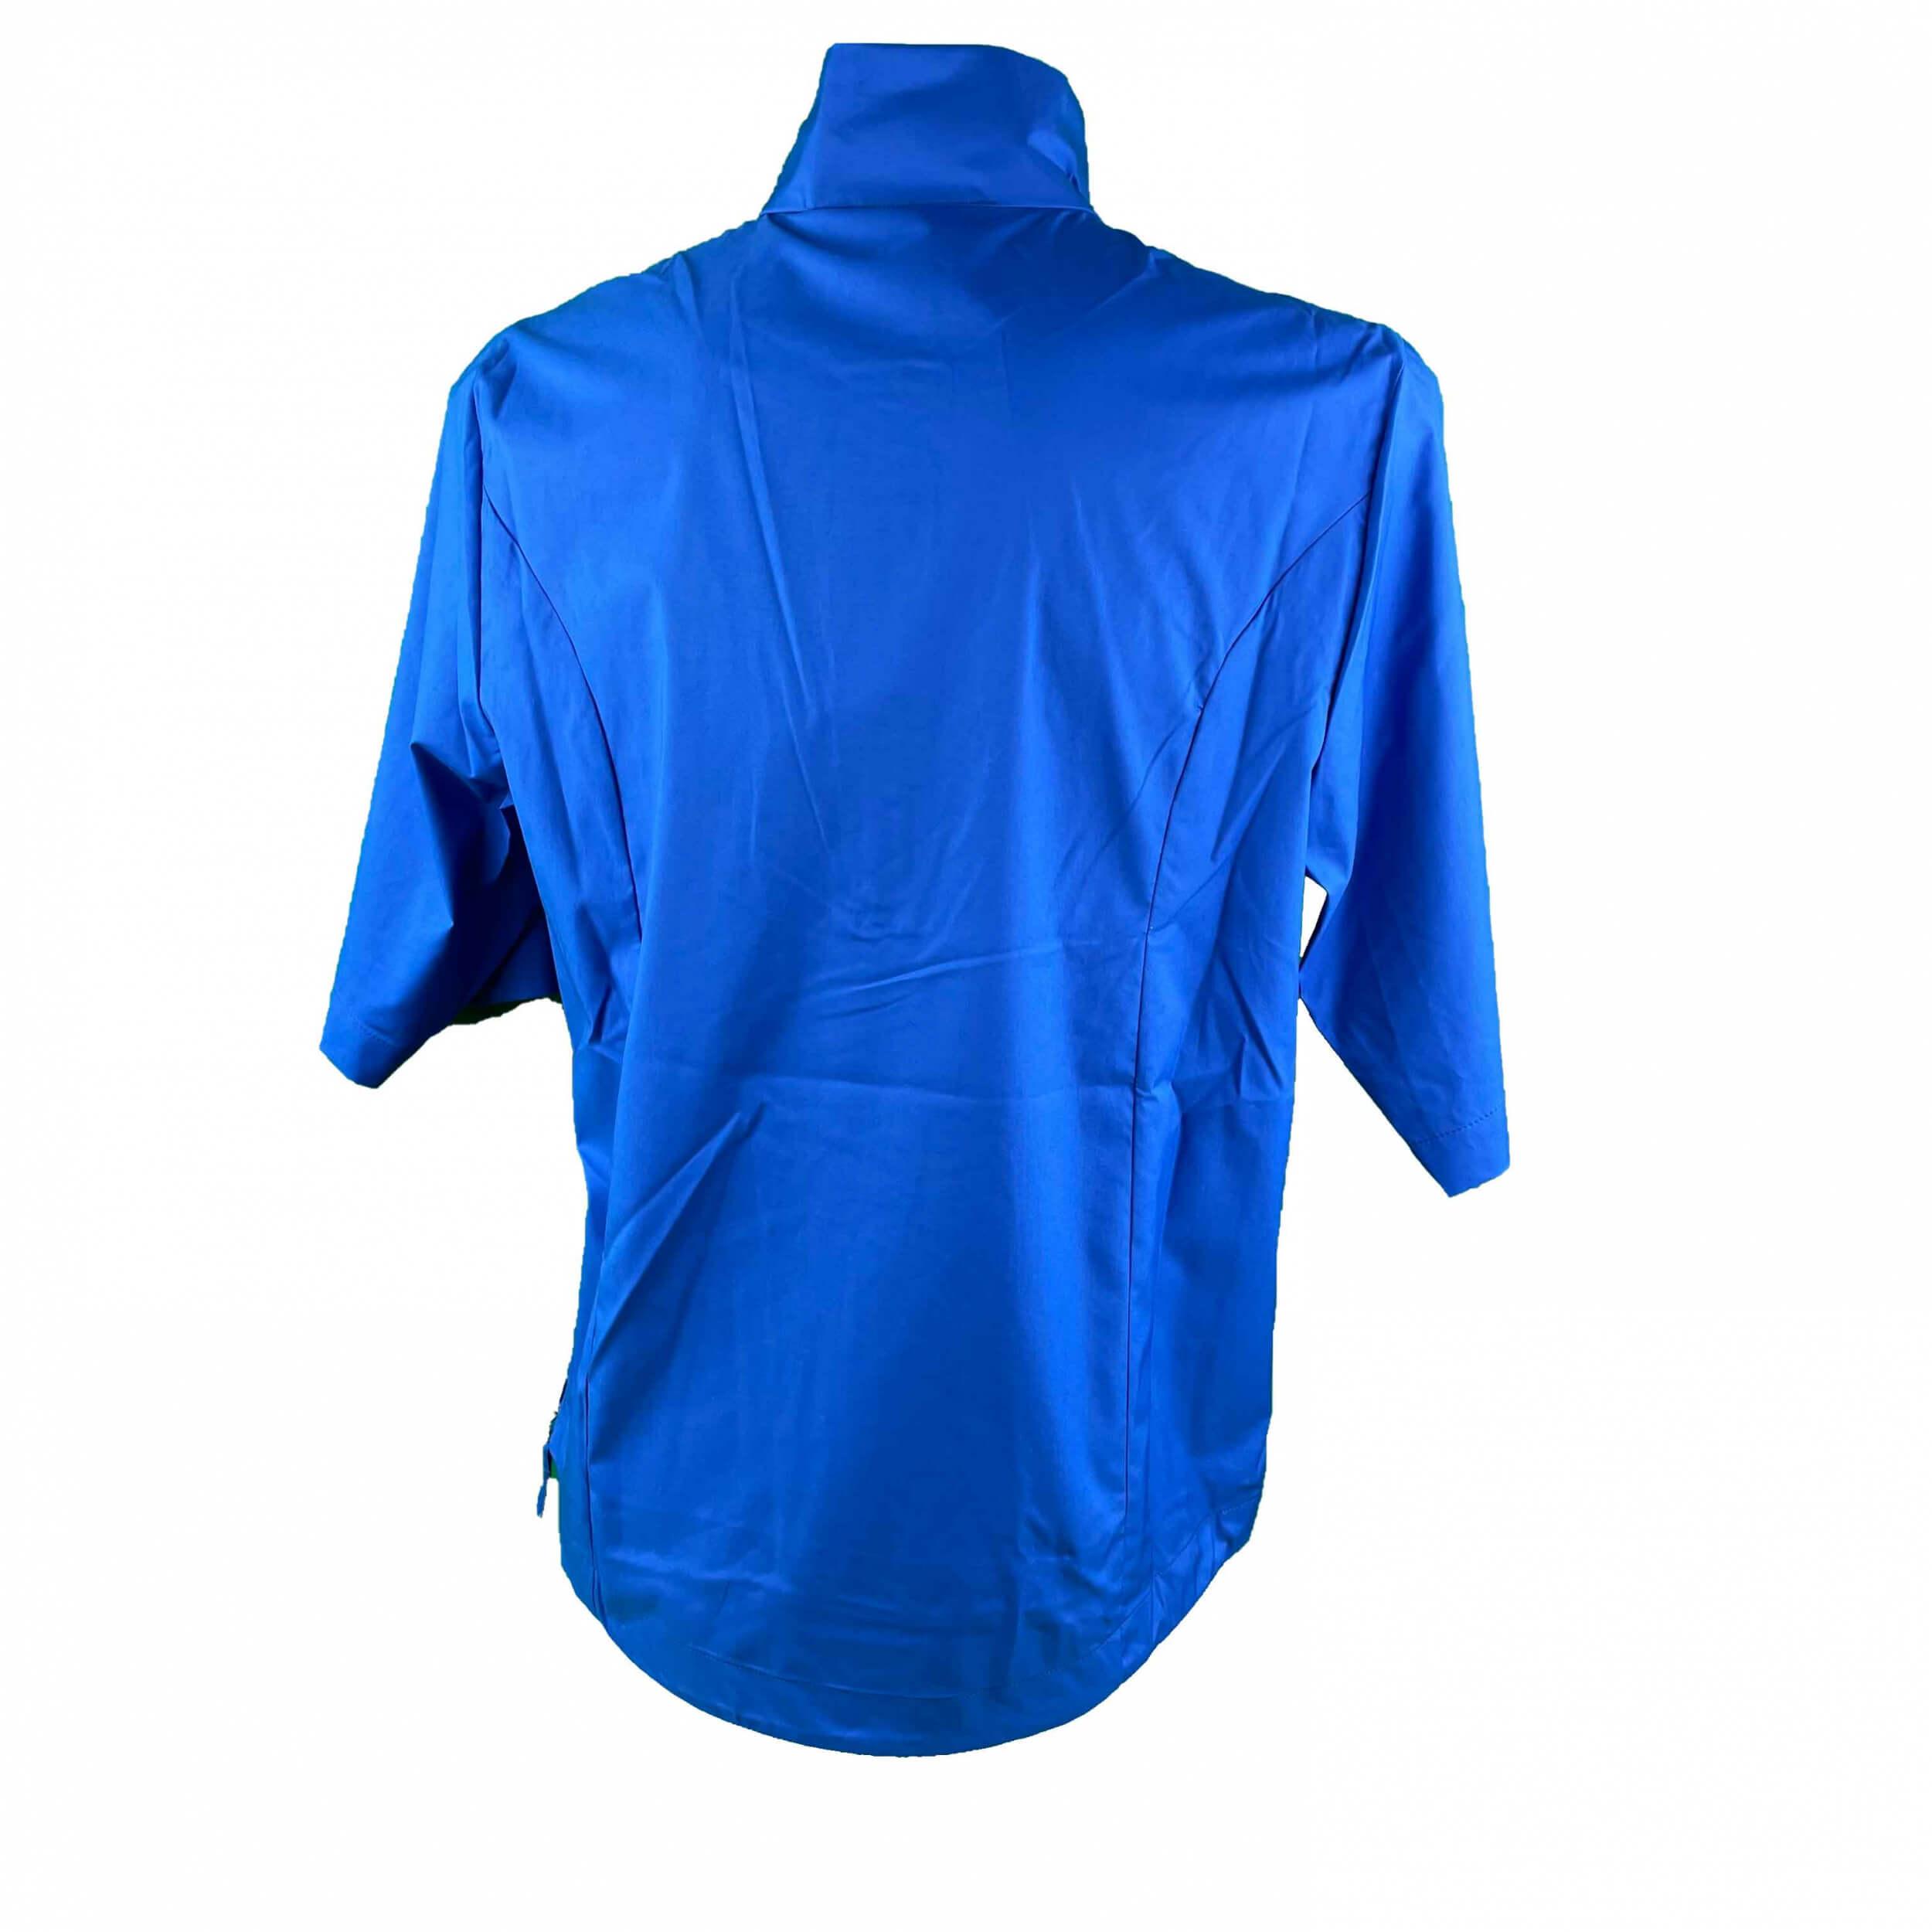 Chervo Herren Shirt Ribbon WIND LOCK blau 594